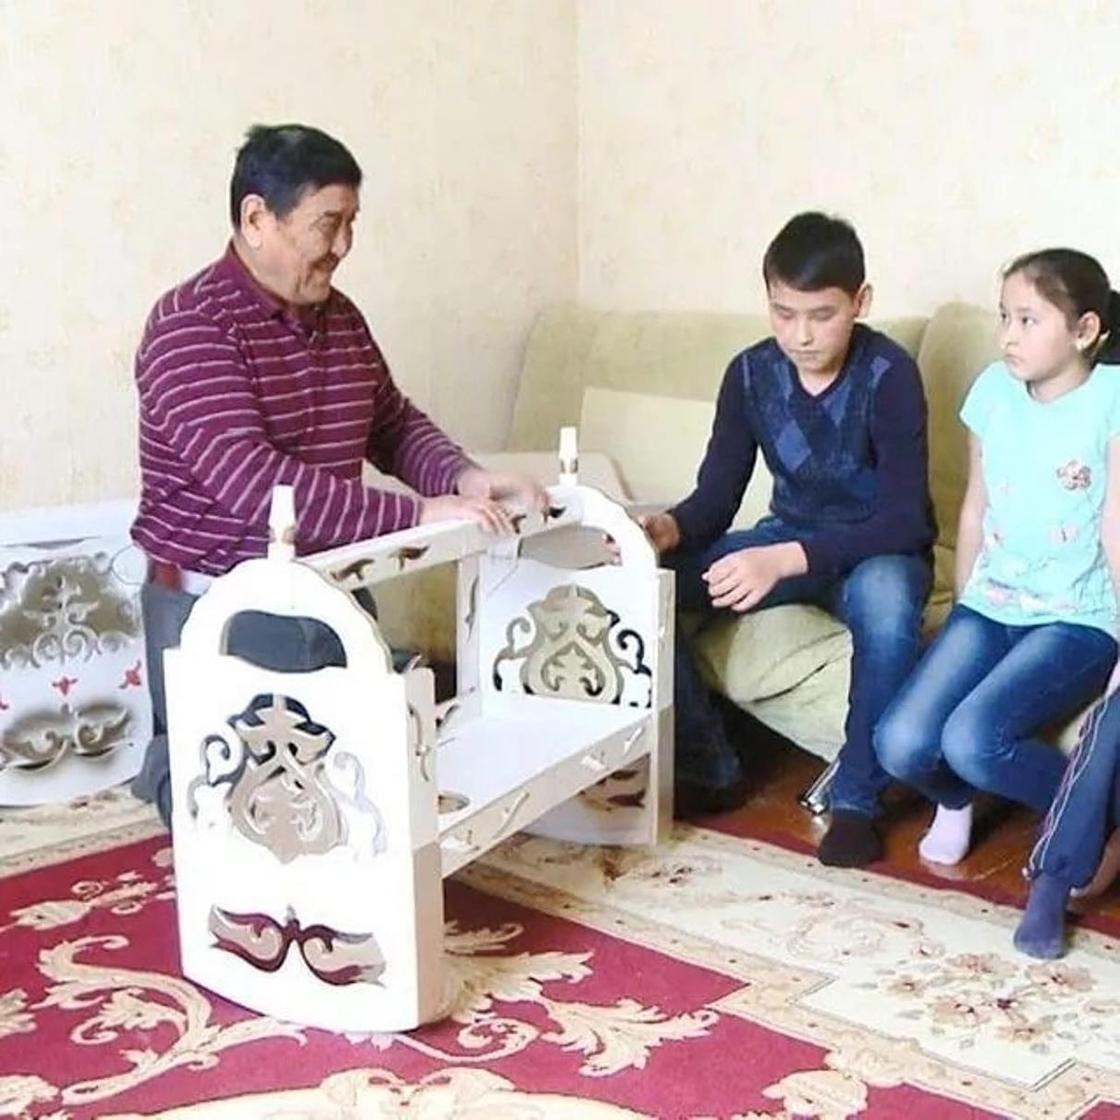 Икея по-казахски: Жители Тараза изобрели бесик-трансформер (фото, видео)